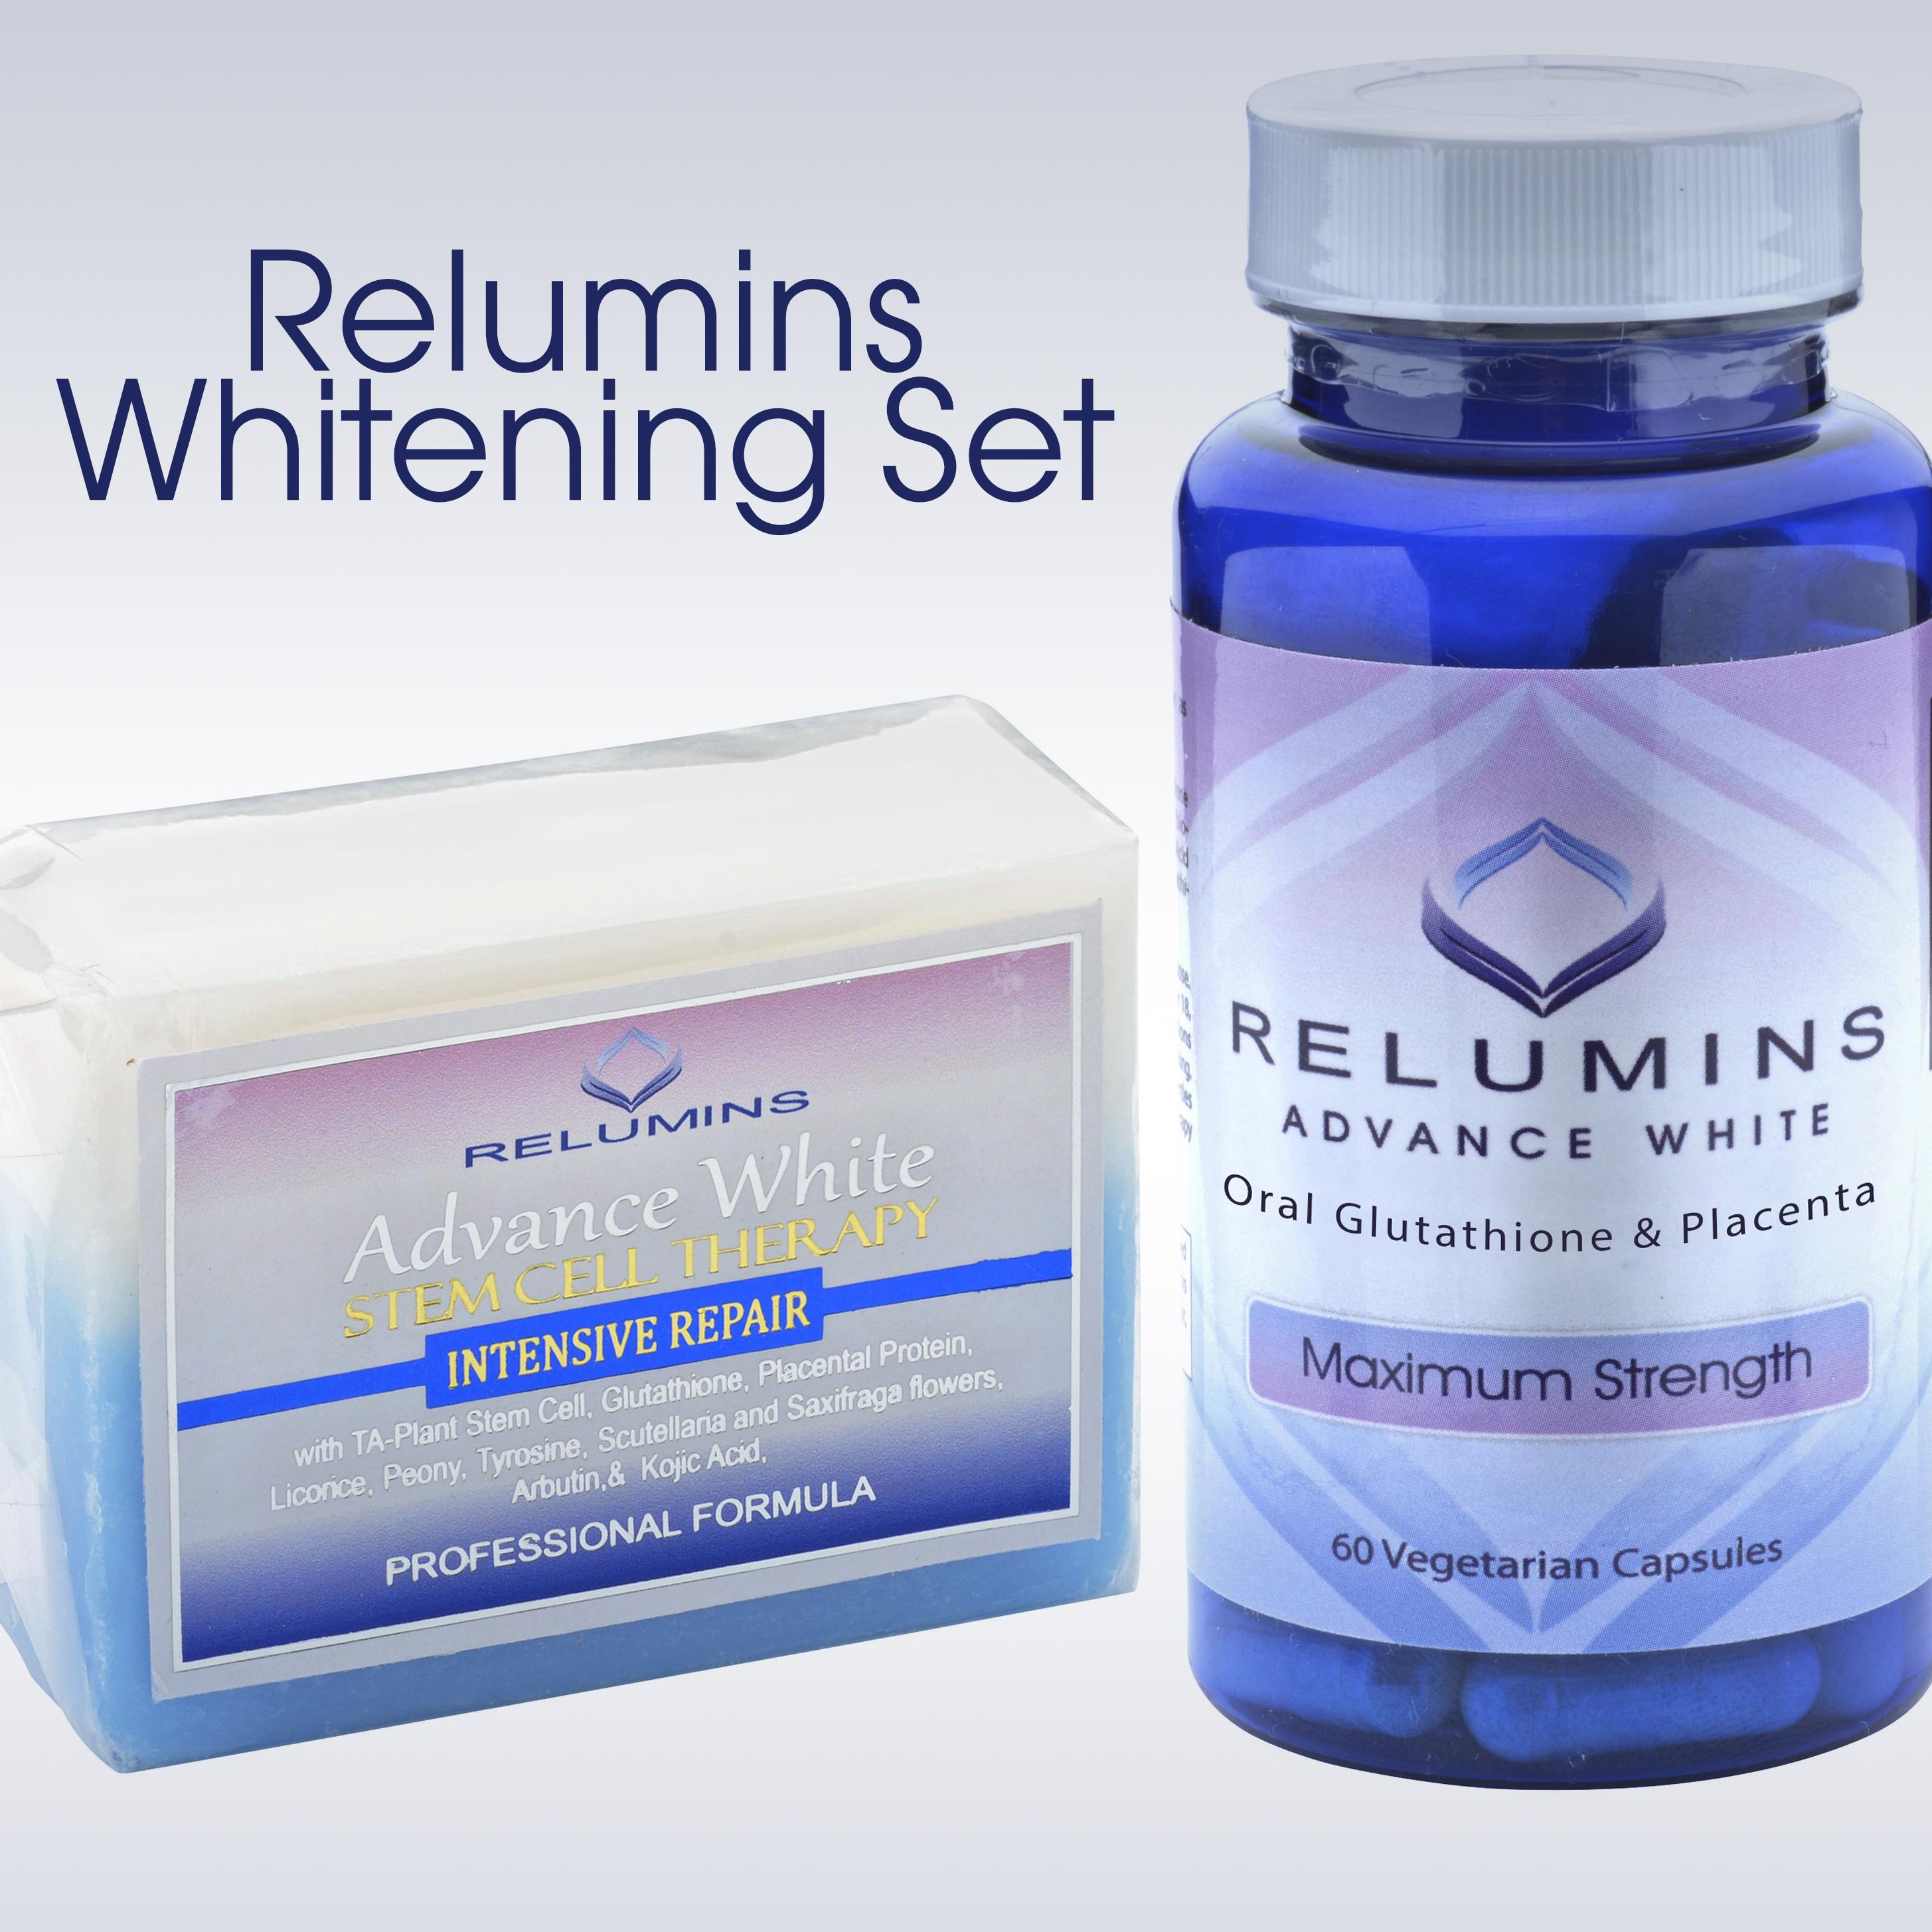 Relumins Whitening Set Advance White Oral Glutathione